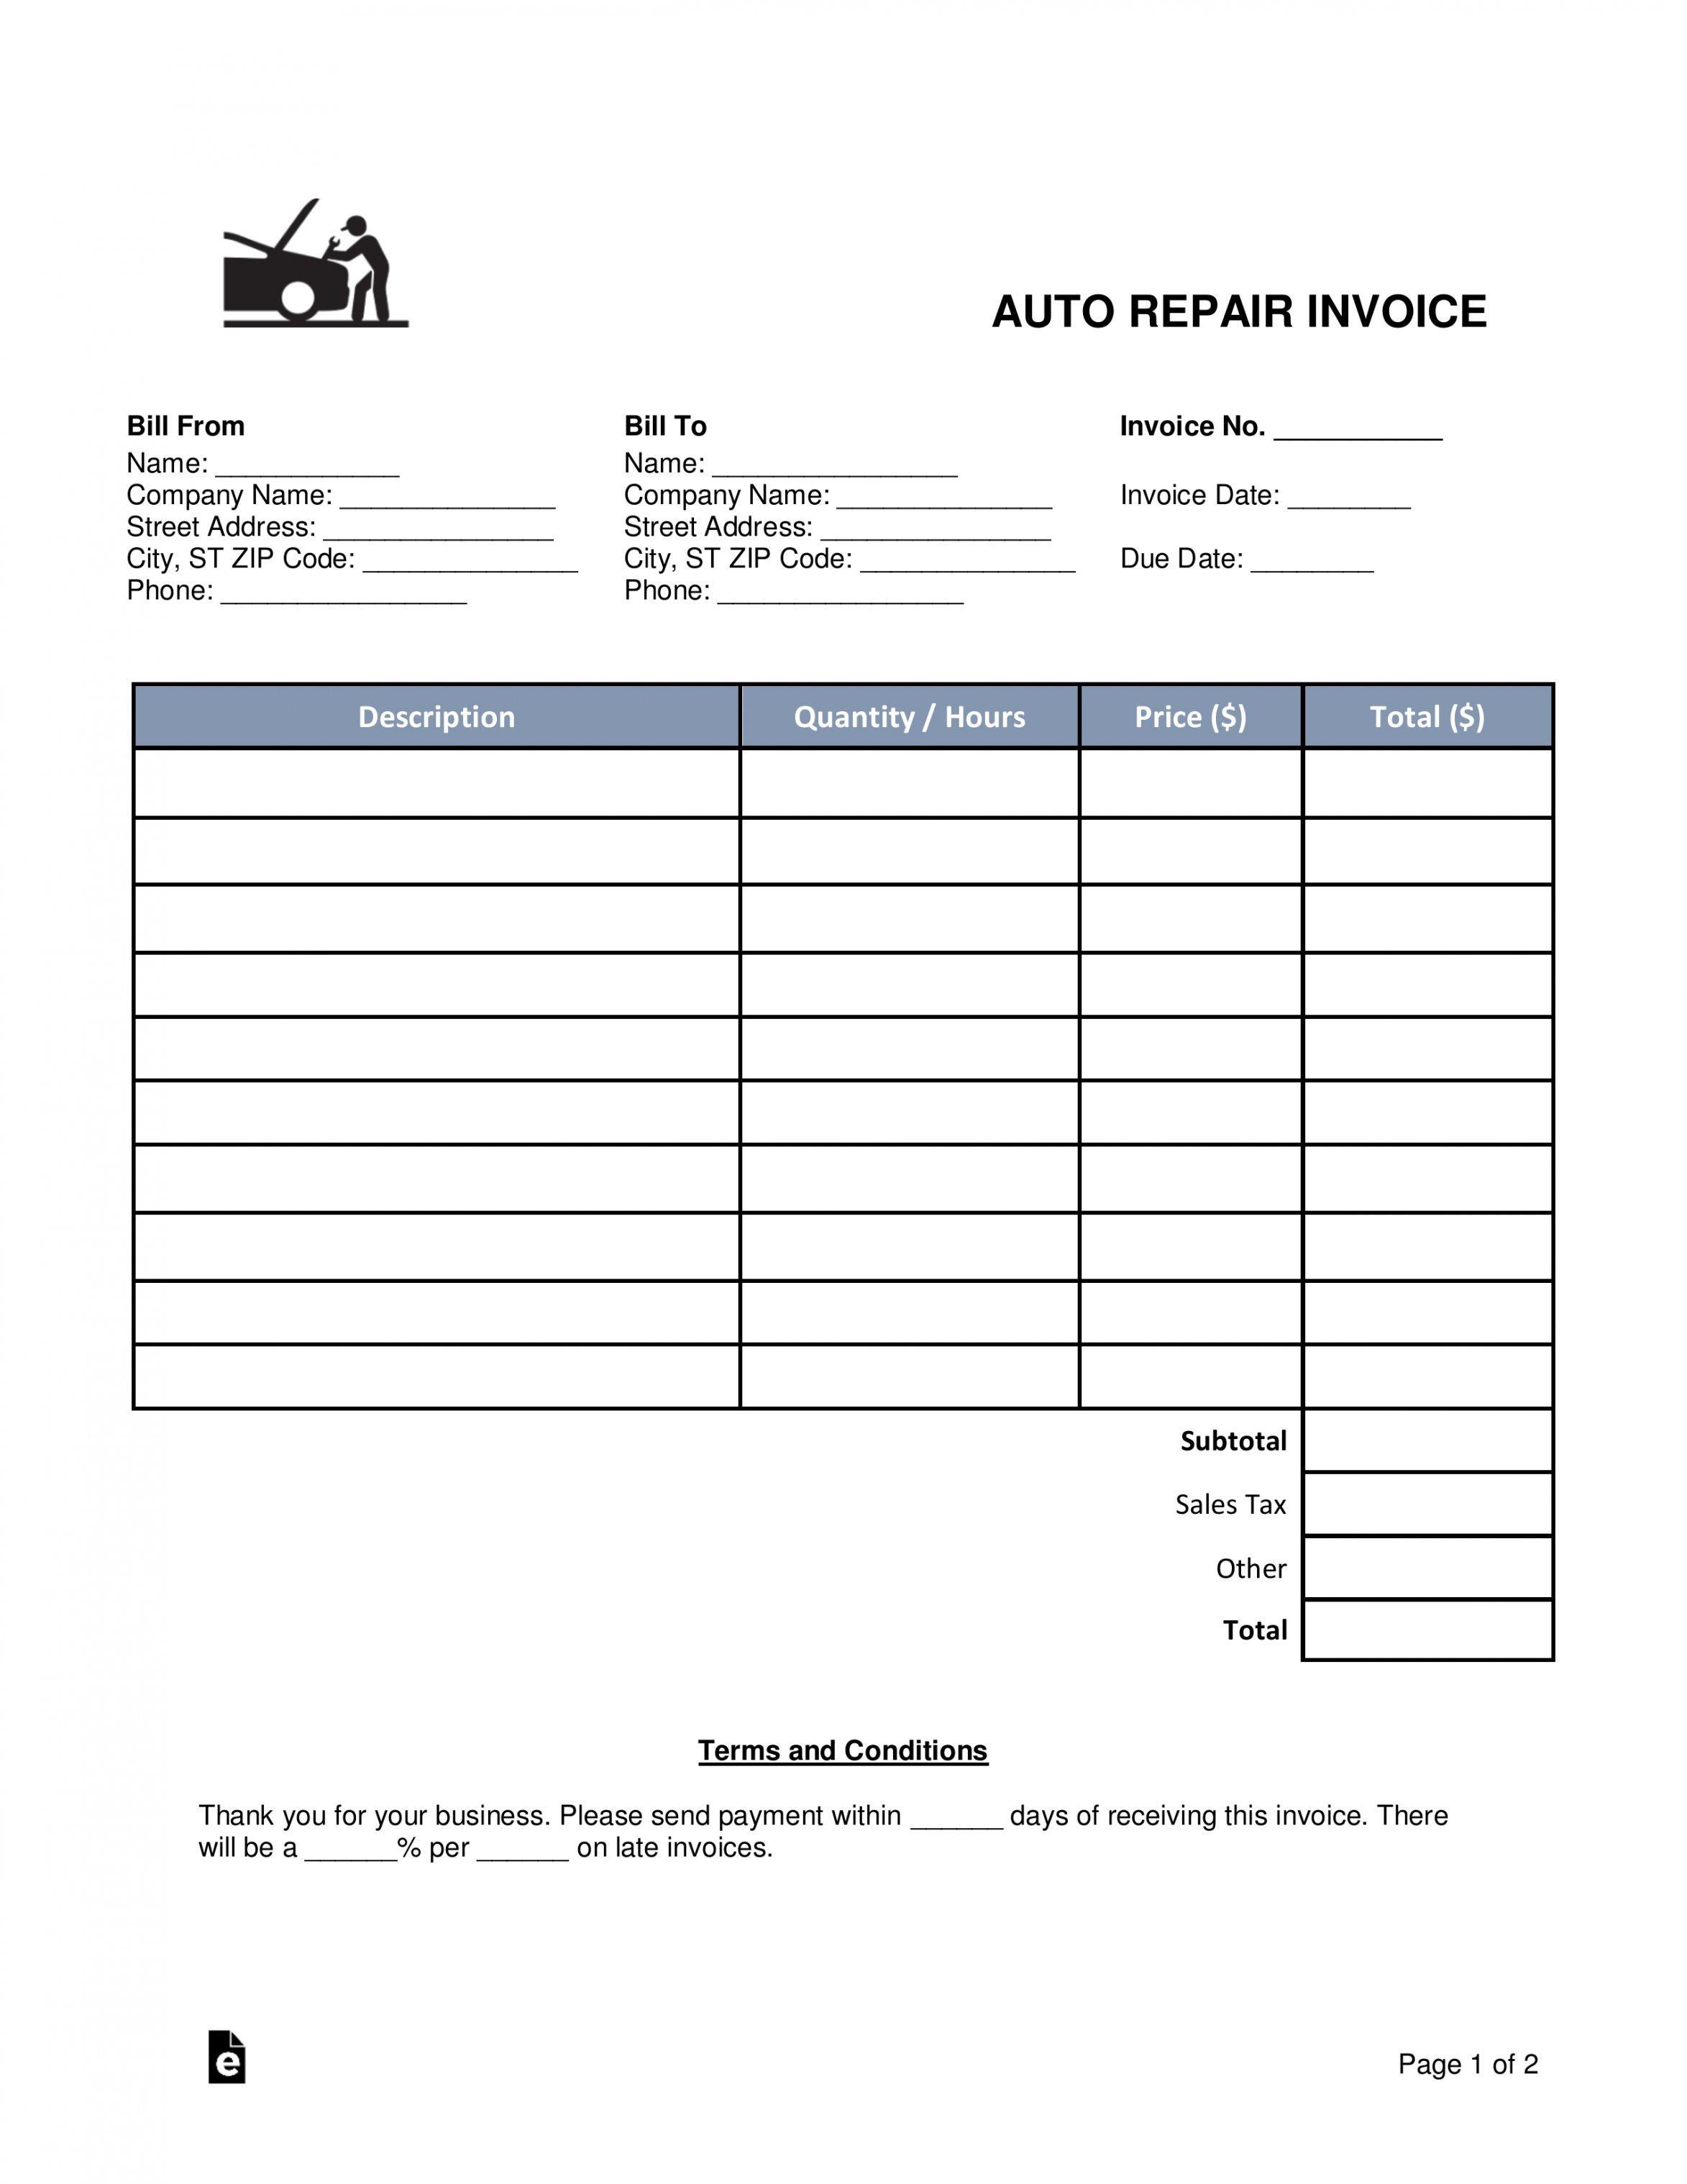 002 Surprising Auto Repair Work Order Template Excel Free Photo Full